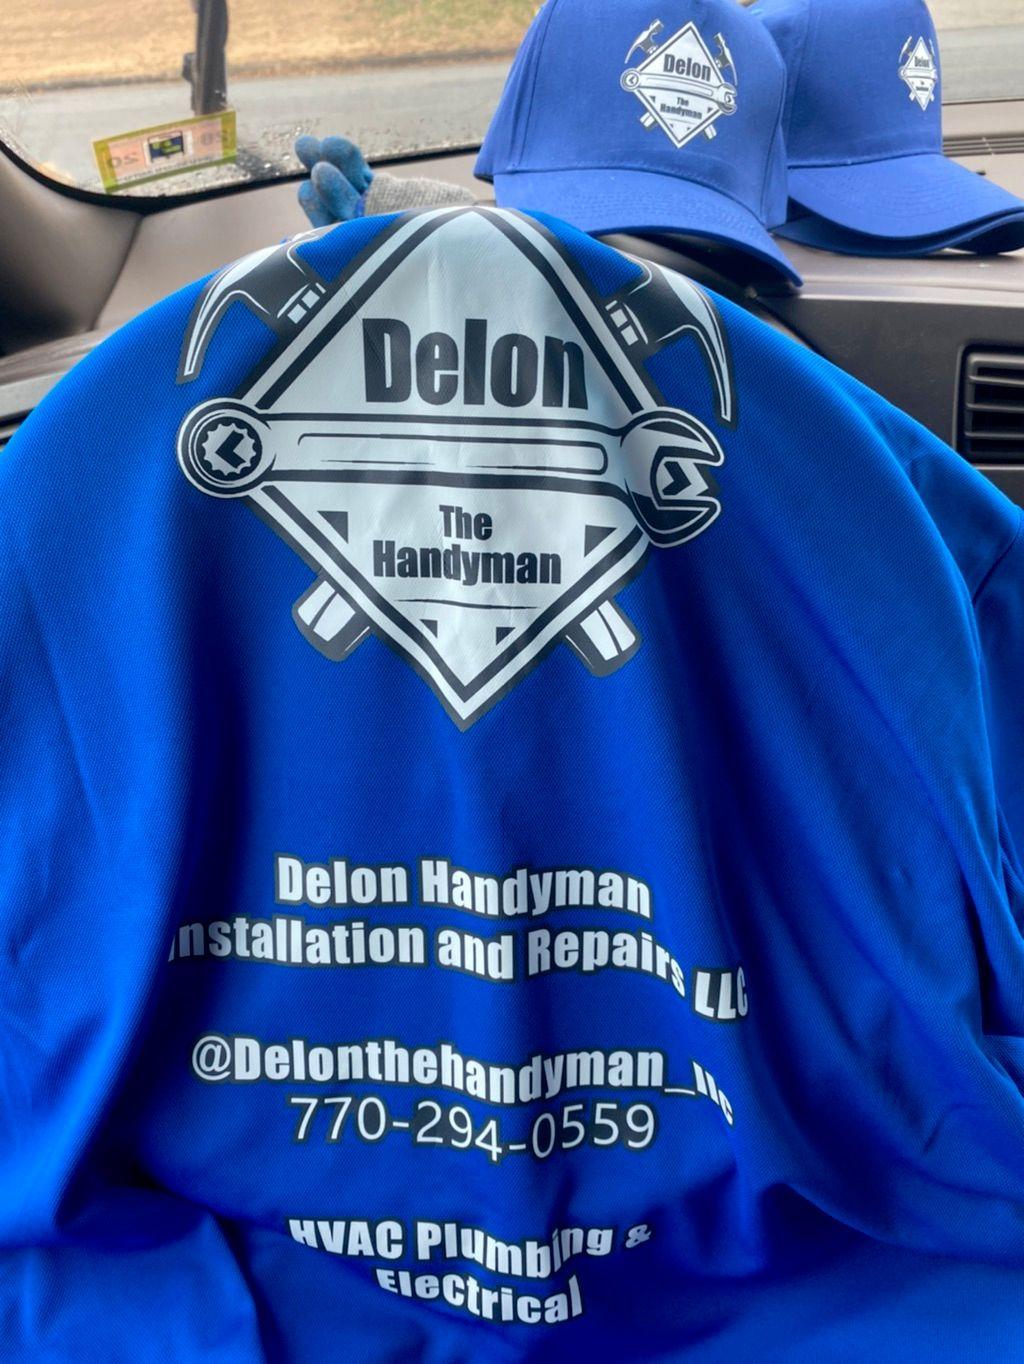 Delon Handyman Installation and repairs LLC